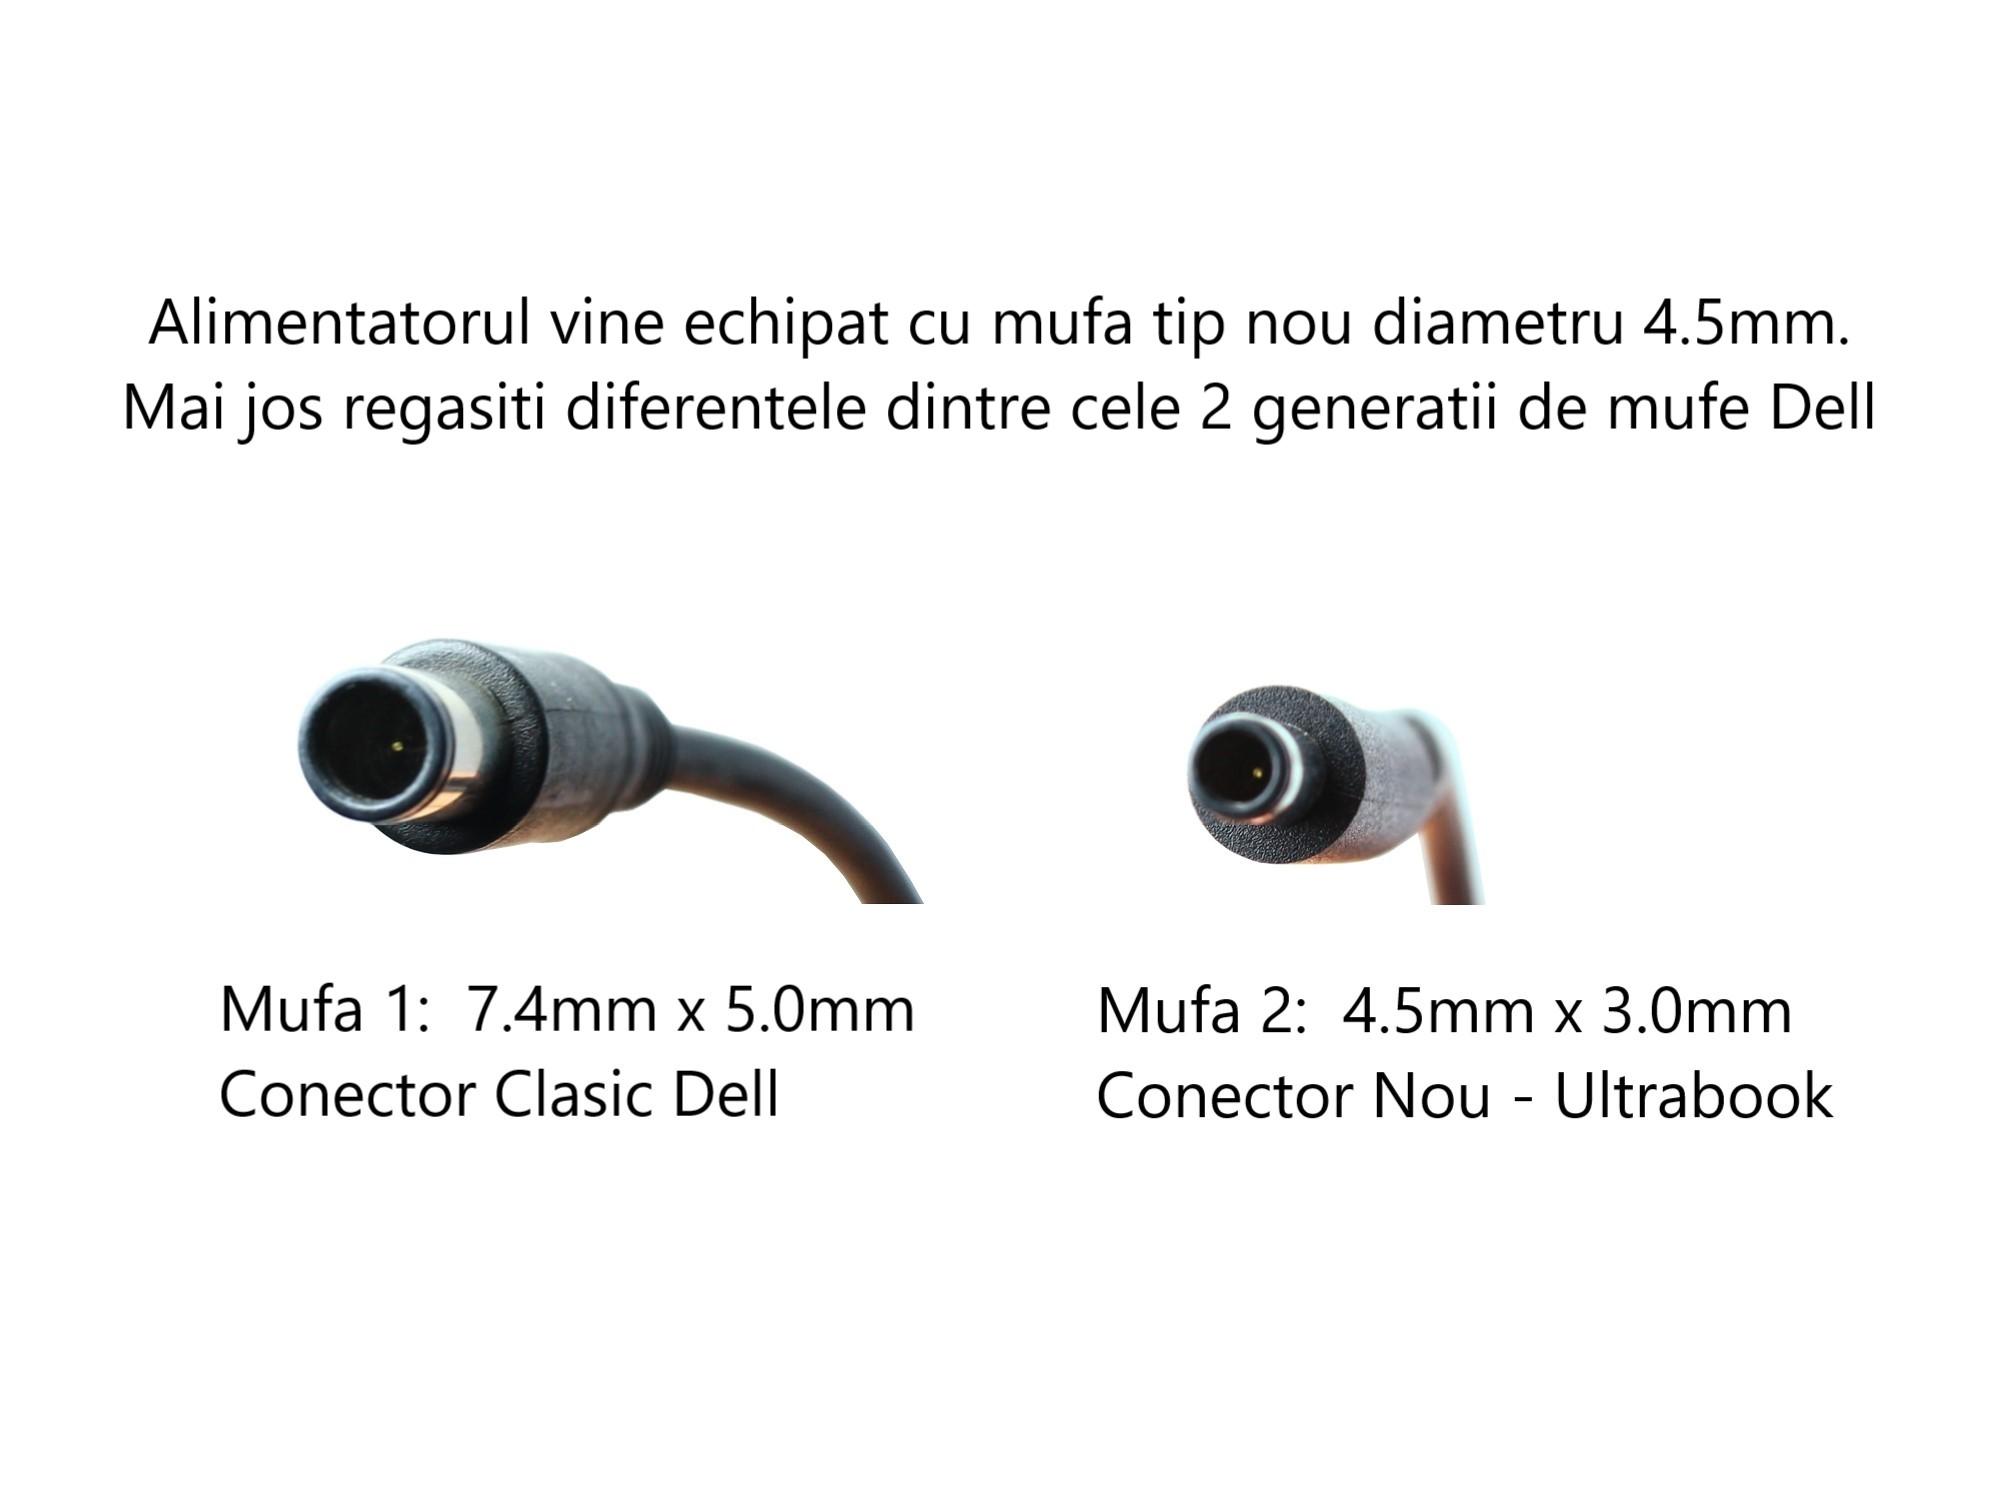 Incarcator laptop Dell Inspiron 5590, 45W, 4.5 mm, PA-20, 3RG0T, PA-1450-66D1